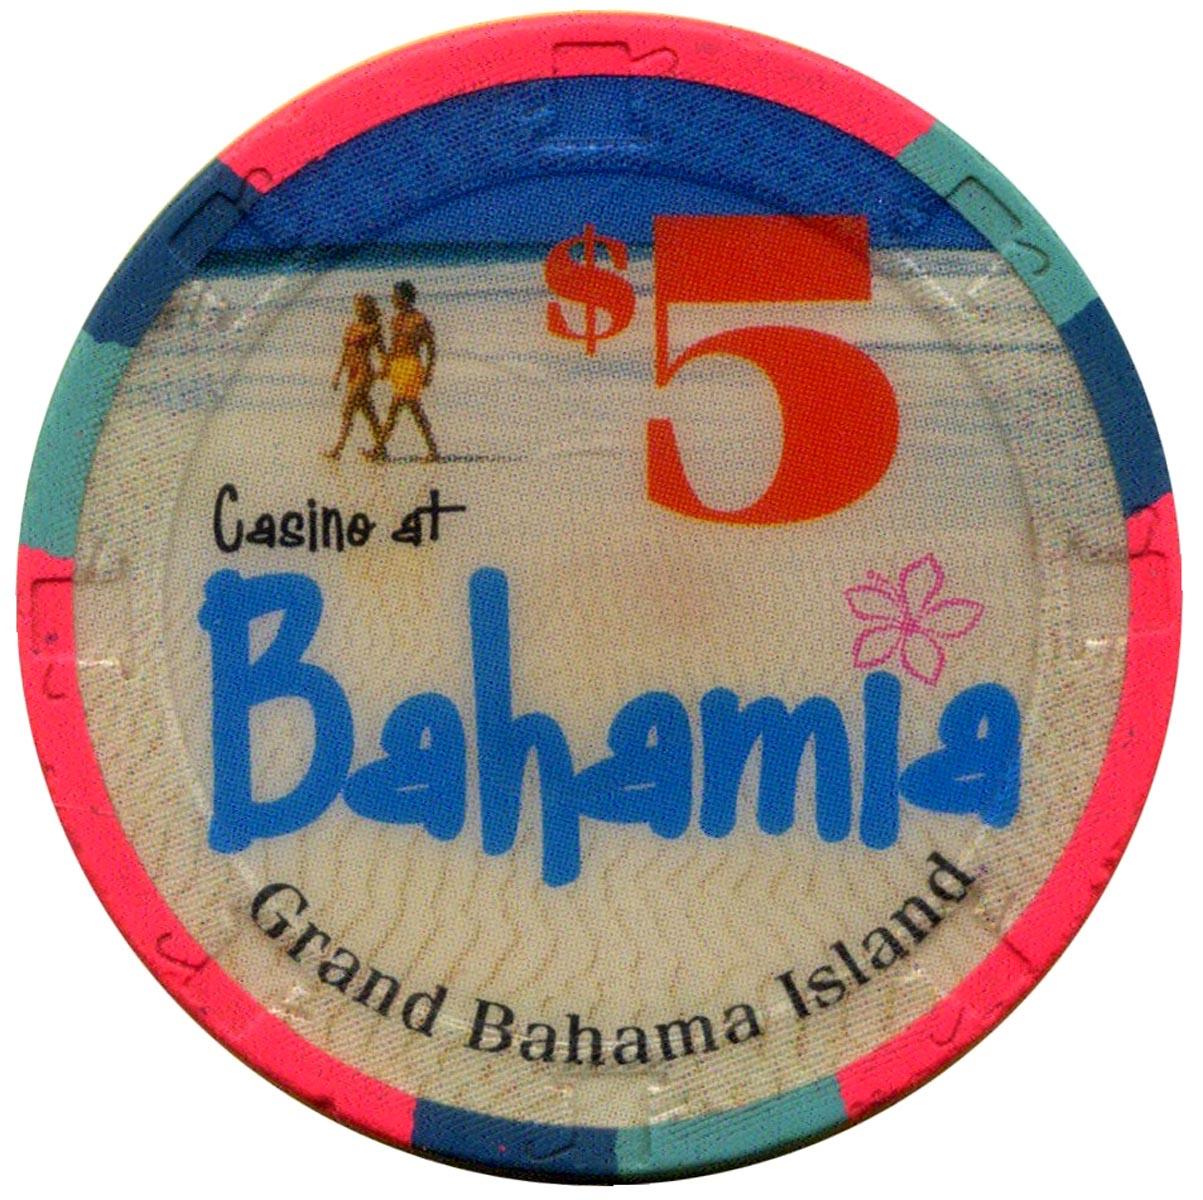 Casinos In Freeport Bahamas